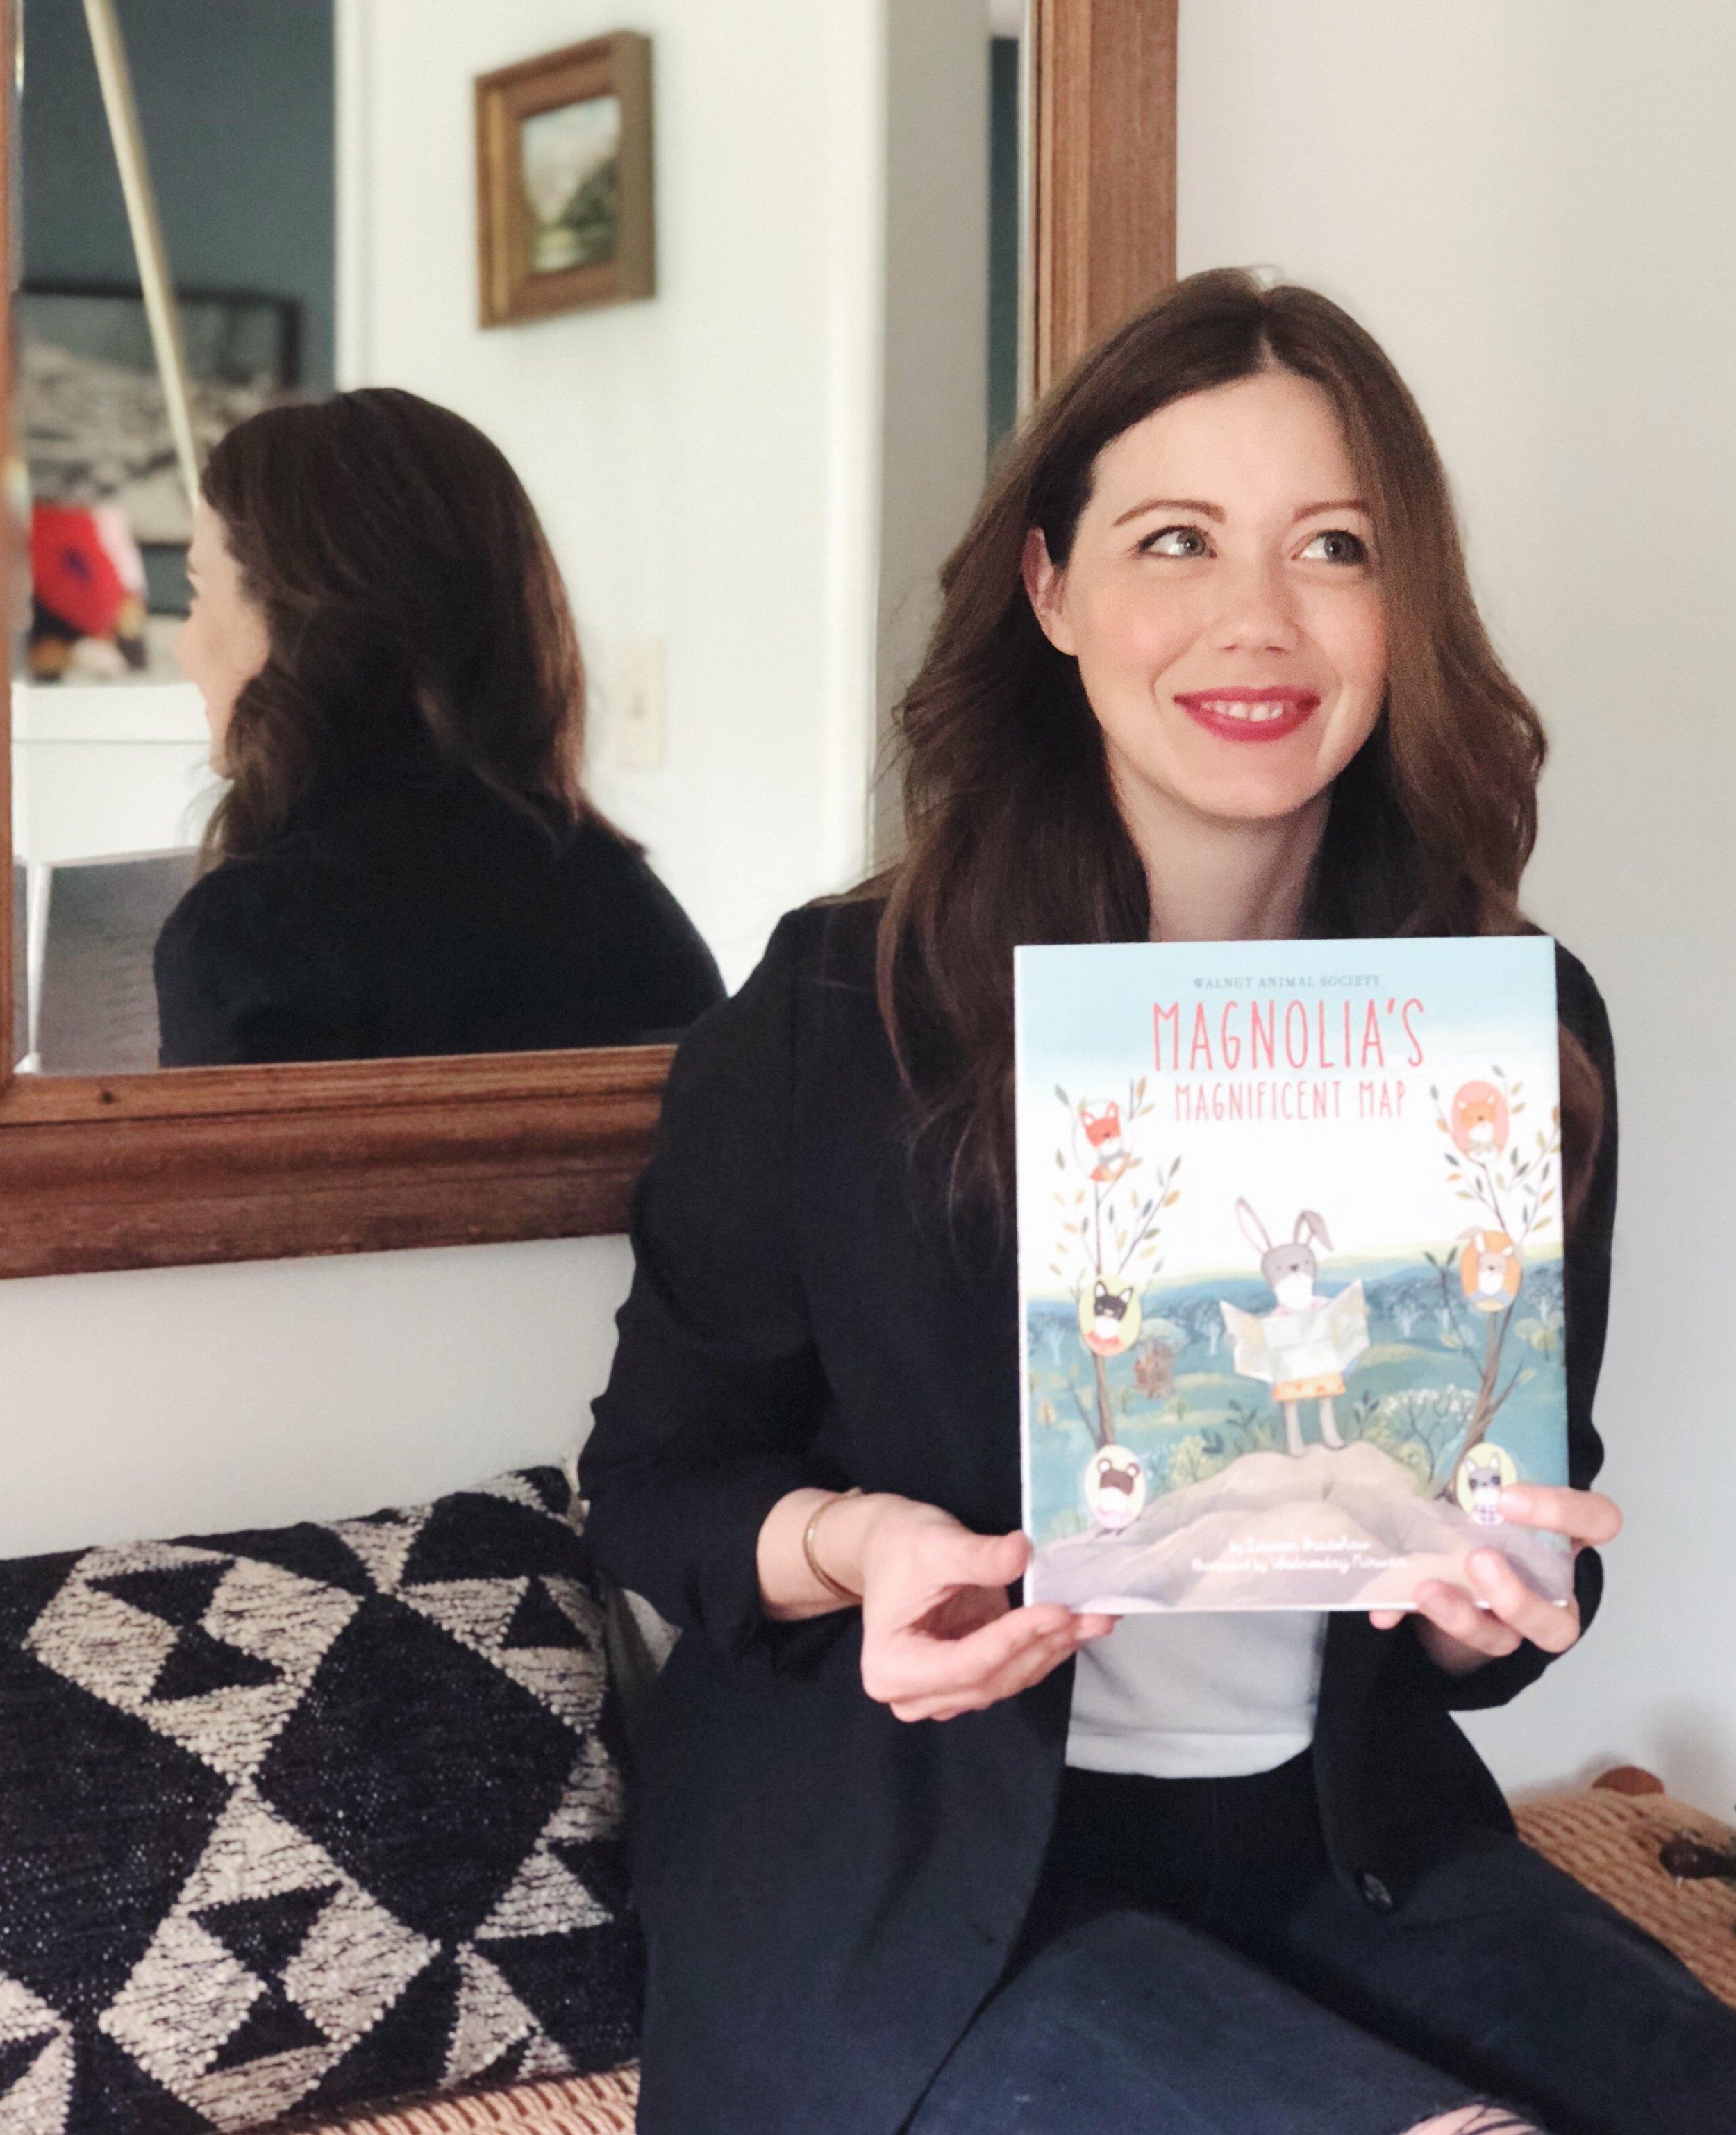 Lauren Bradshaw Magnolias Magnificent Map Author